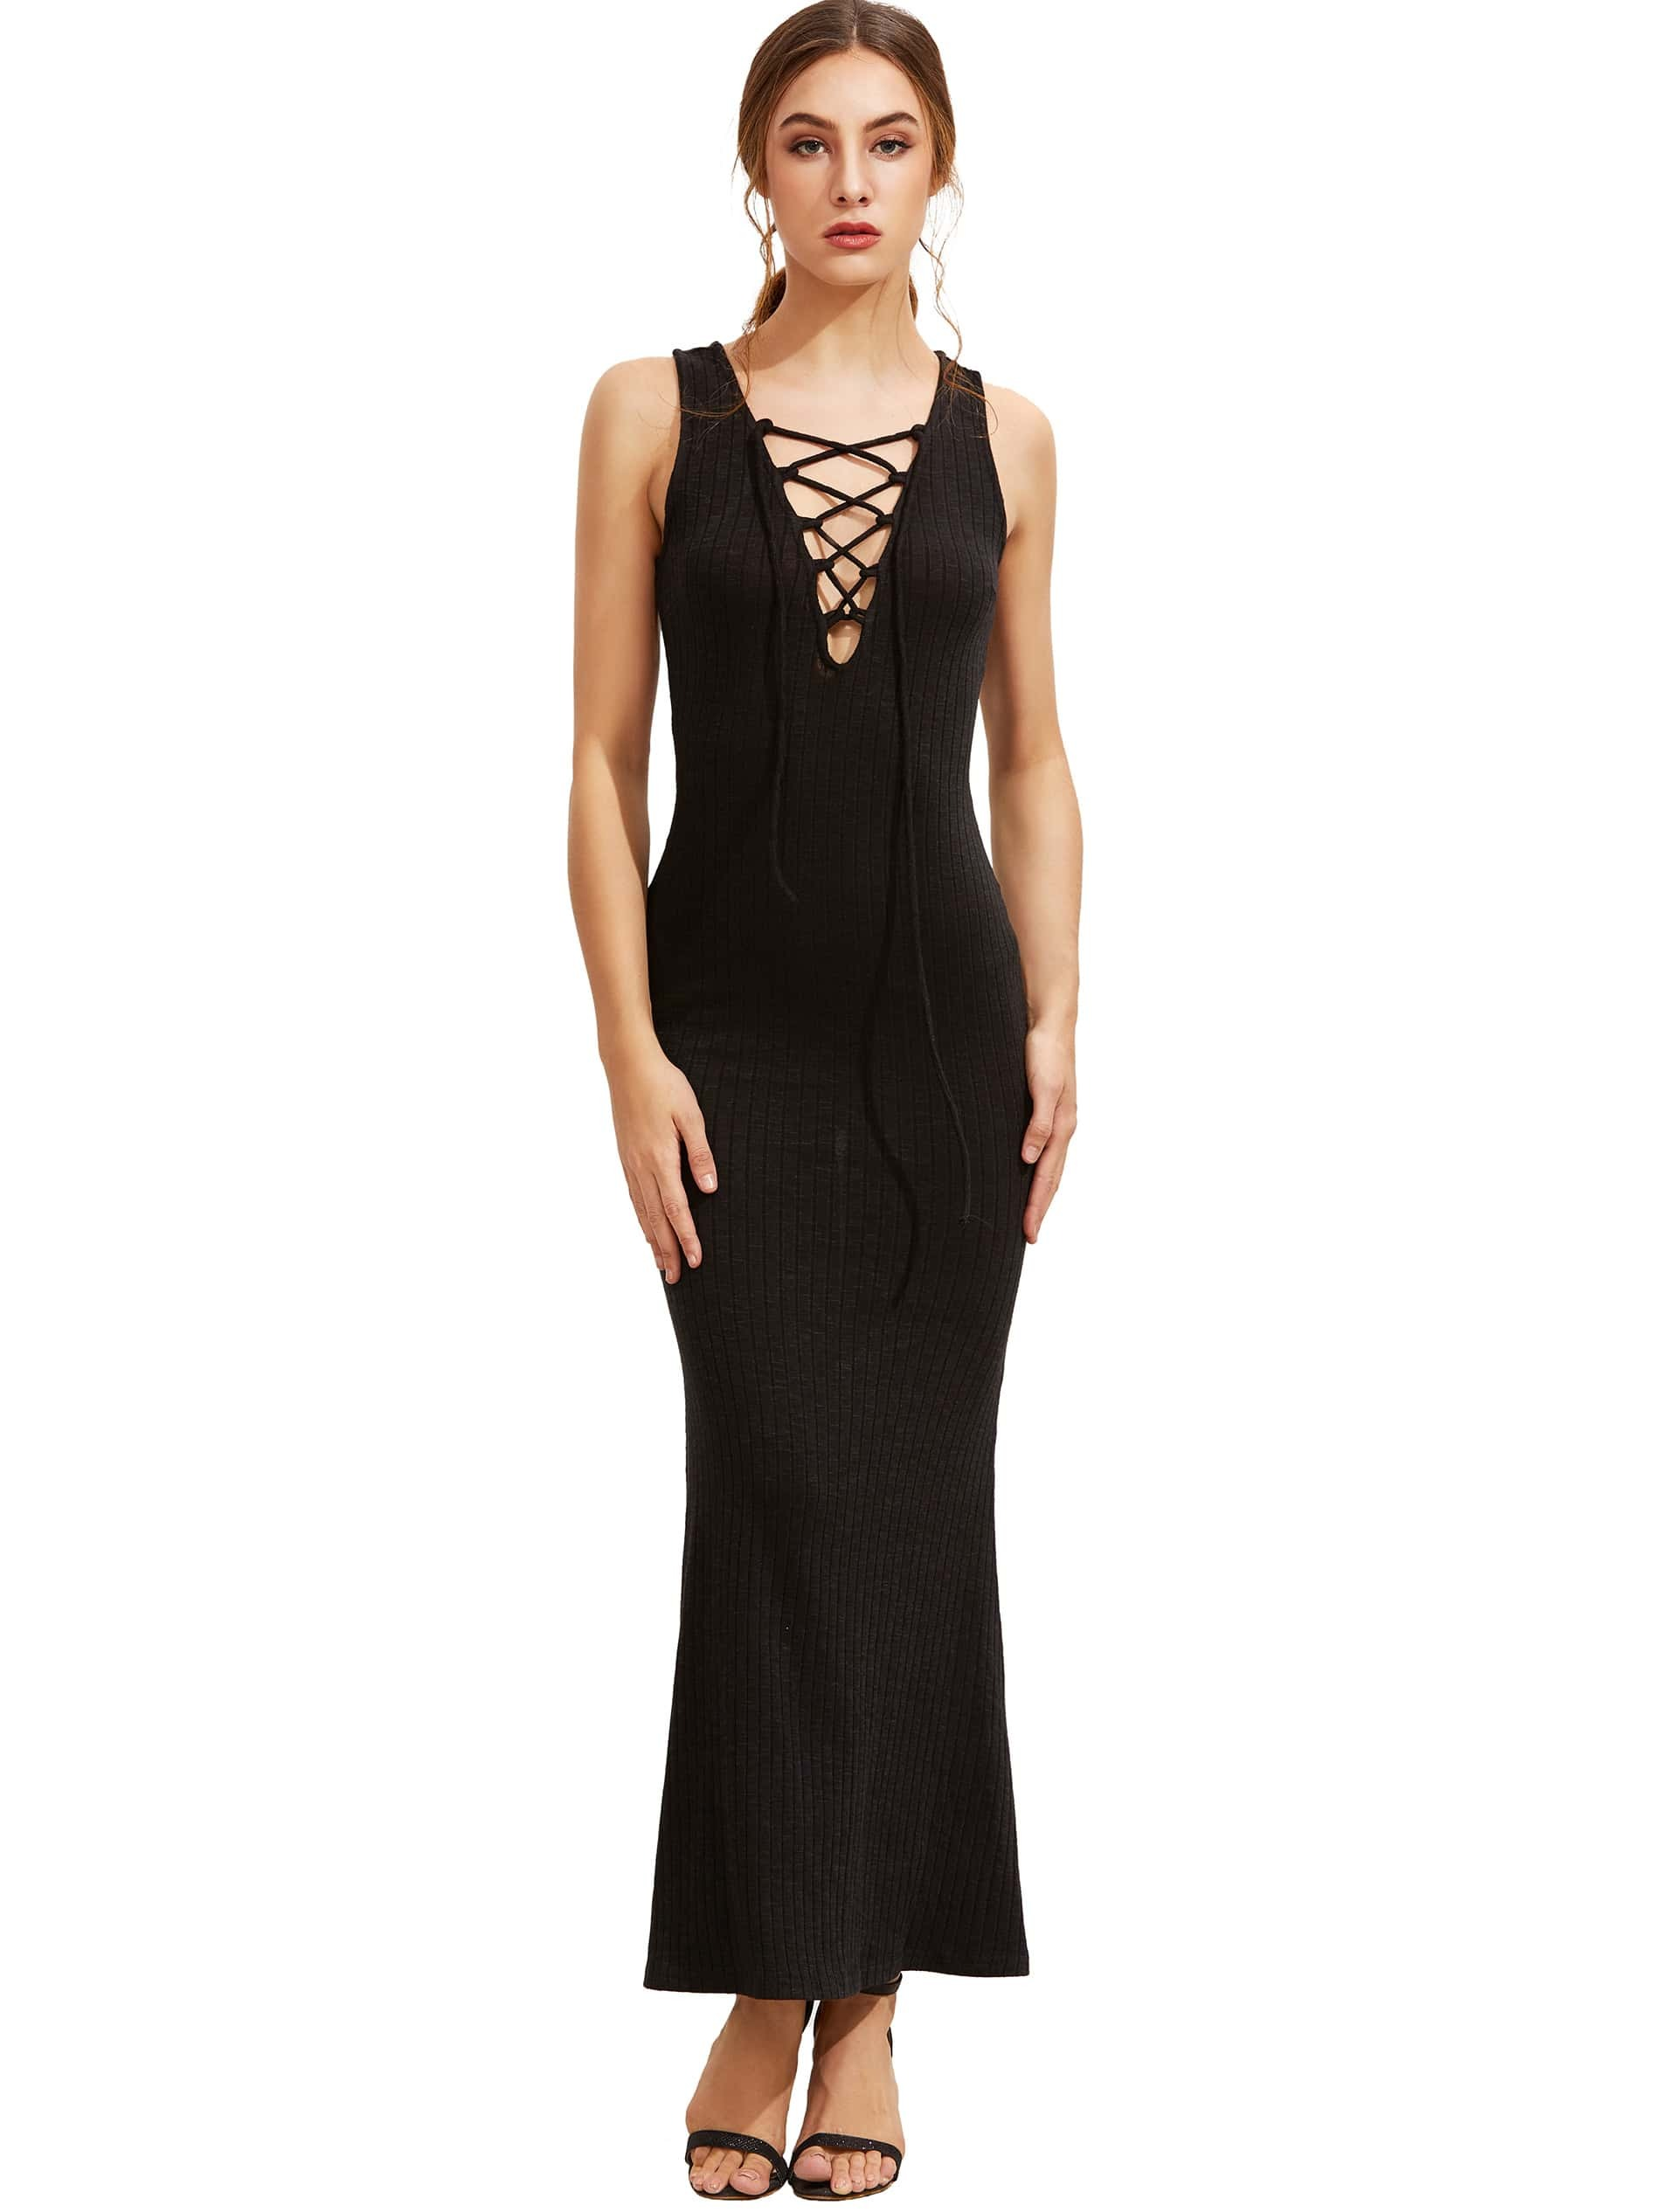 Plunging Neckline Eyelet Lace Up Ribbed Dress dress160825555